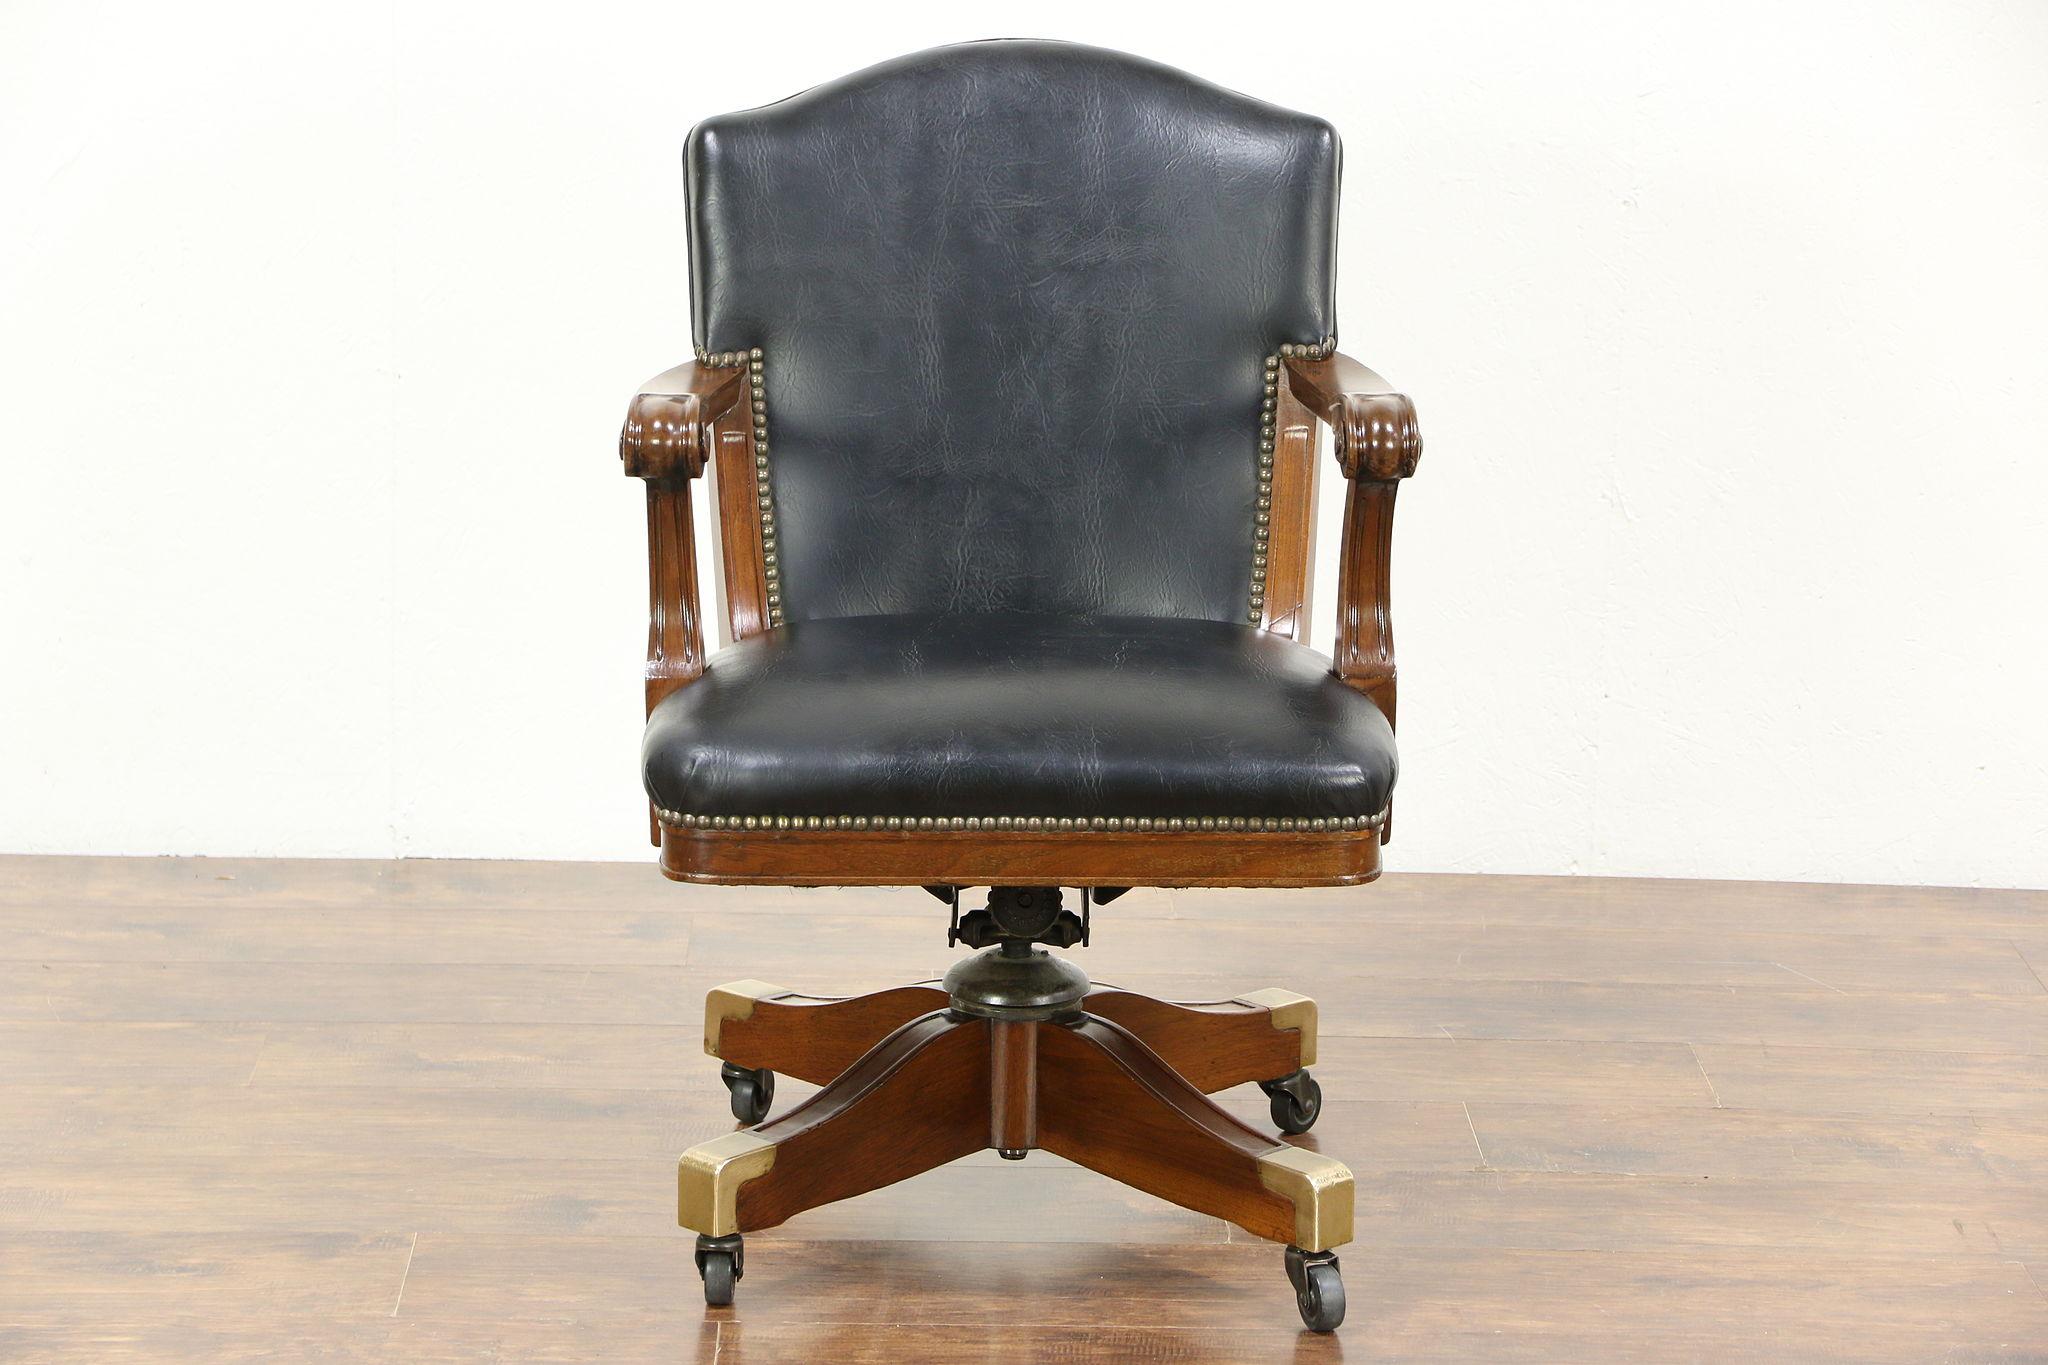 Walnut Swivel Adjustable 1915 Antique Desk Chair, Faux Leather